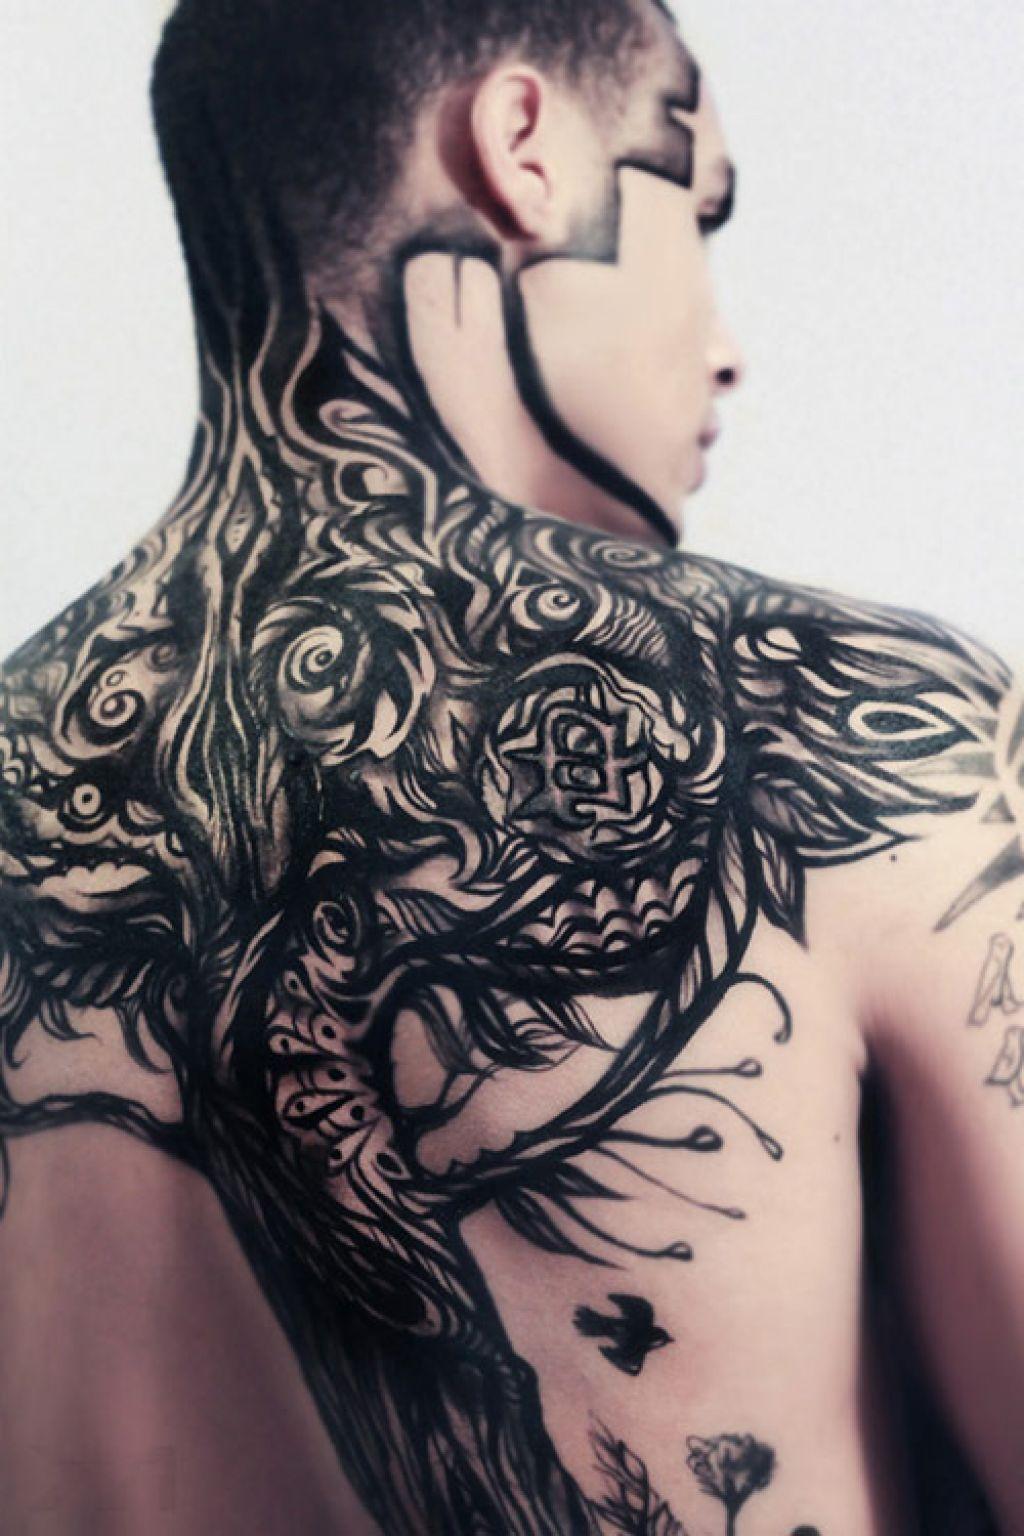 Yakuza dragon tattoo meaning yakuza japanese tattoos yakuza tattoo yakuza dragon tattoo meaning yakuza japanese tattoos yakuza tattoo biocorpaavc Choice Image